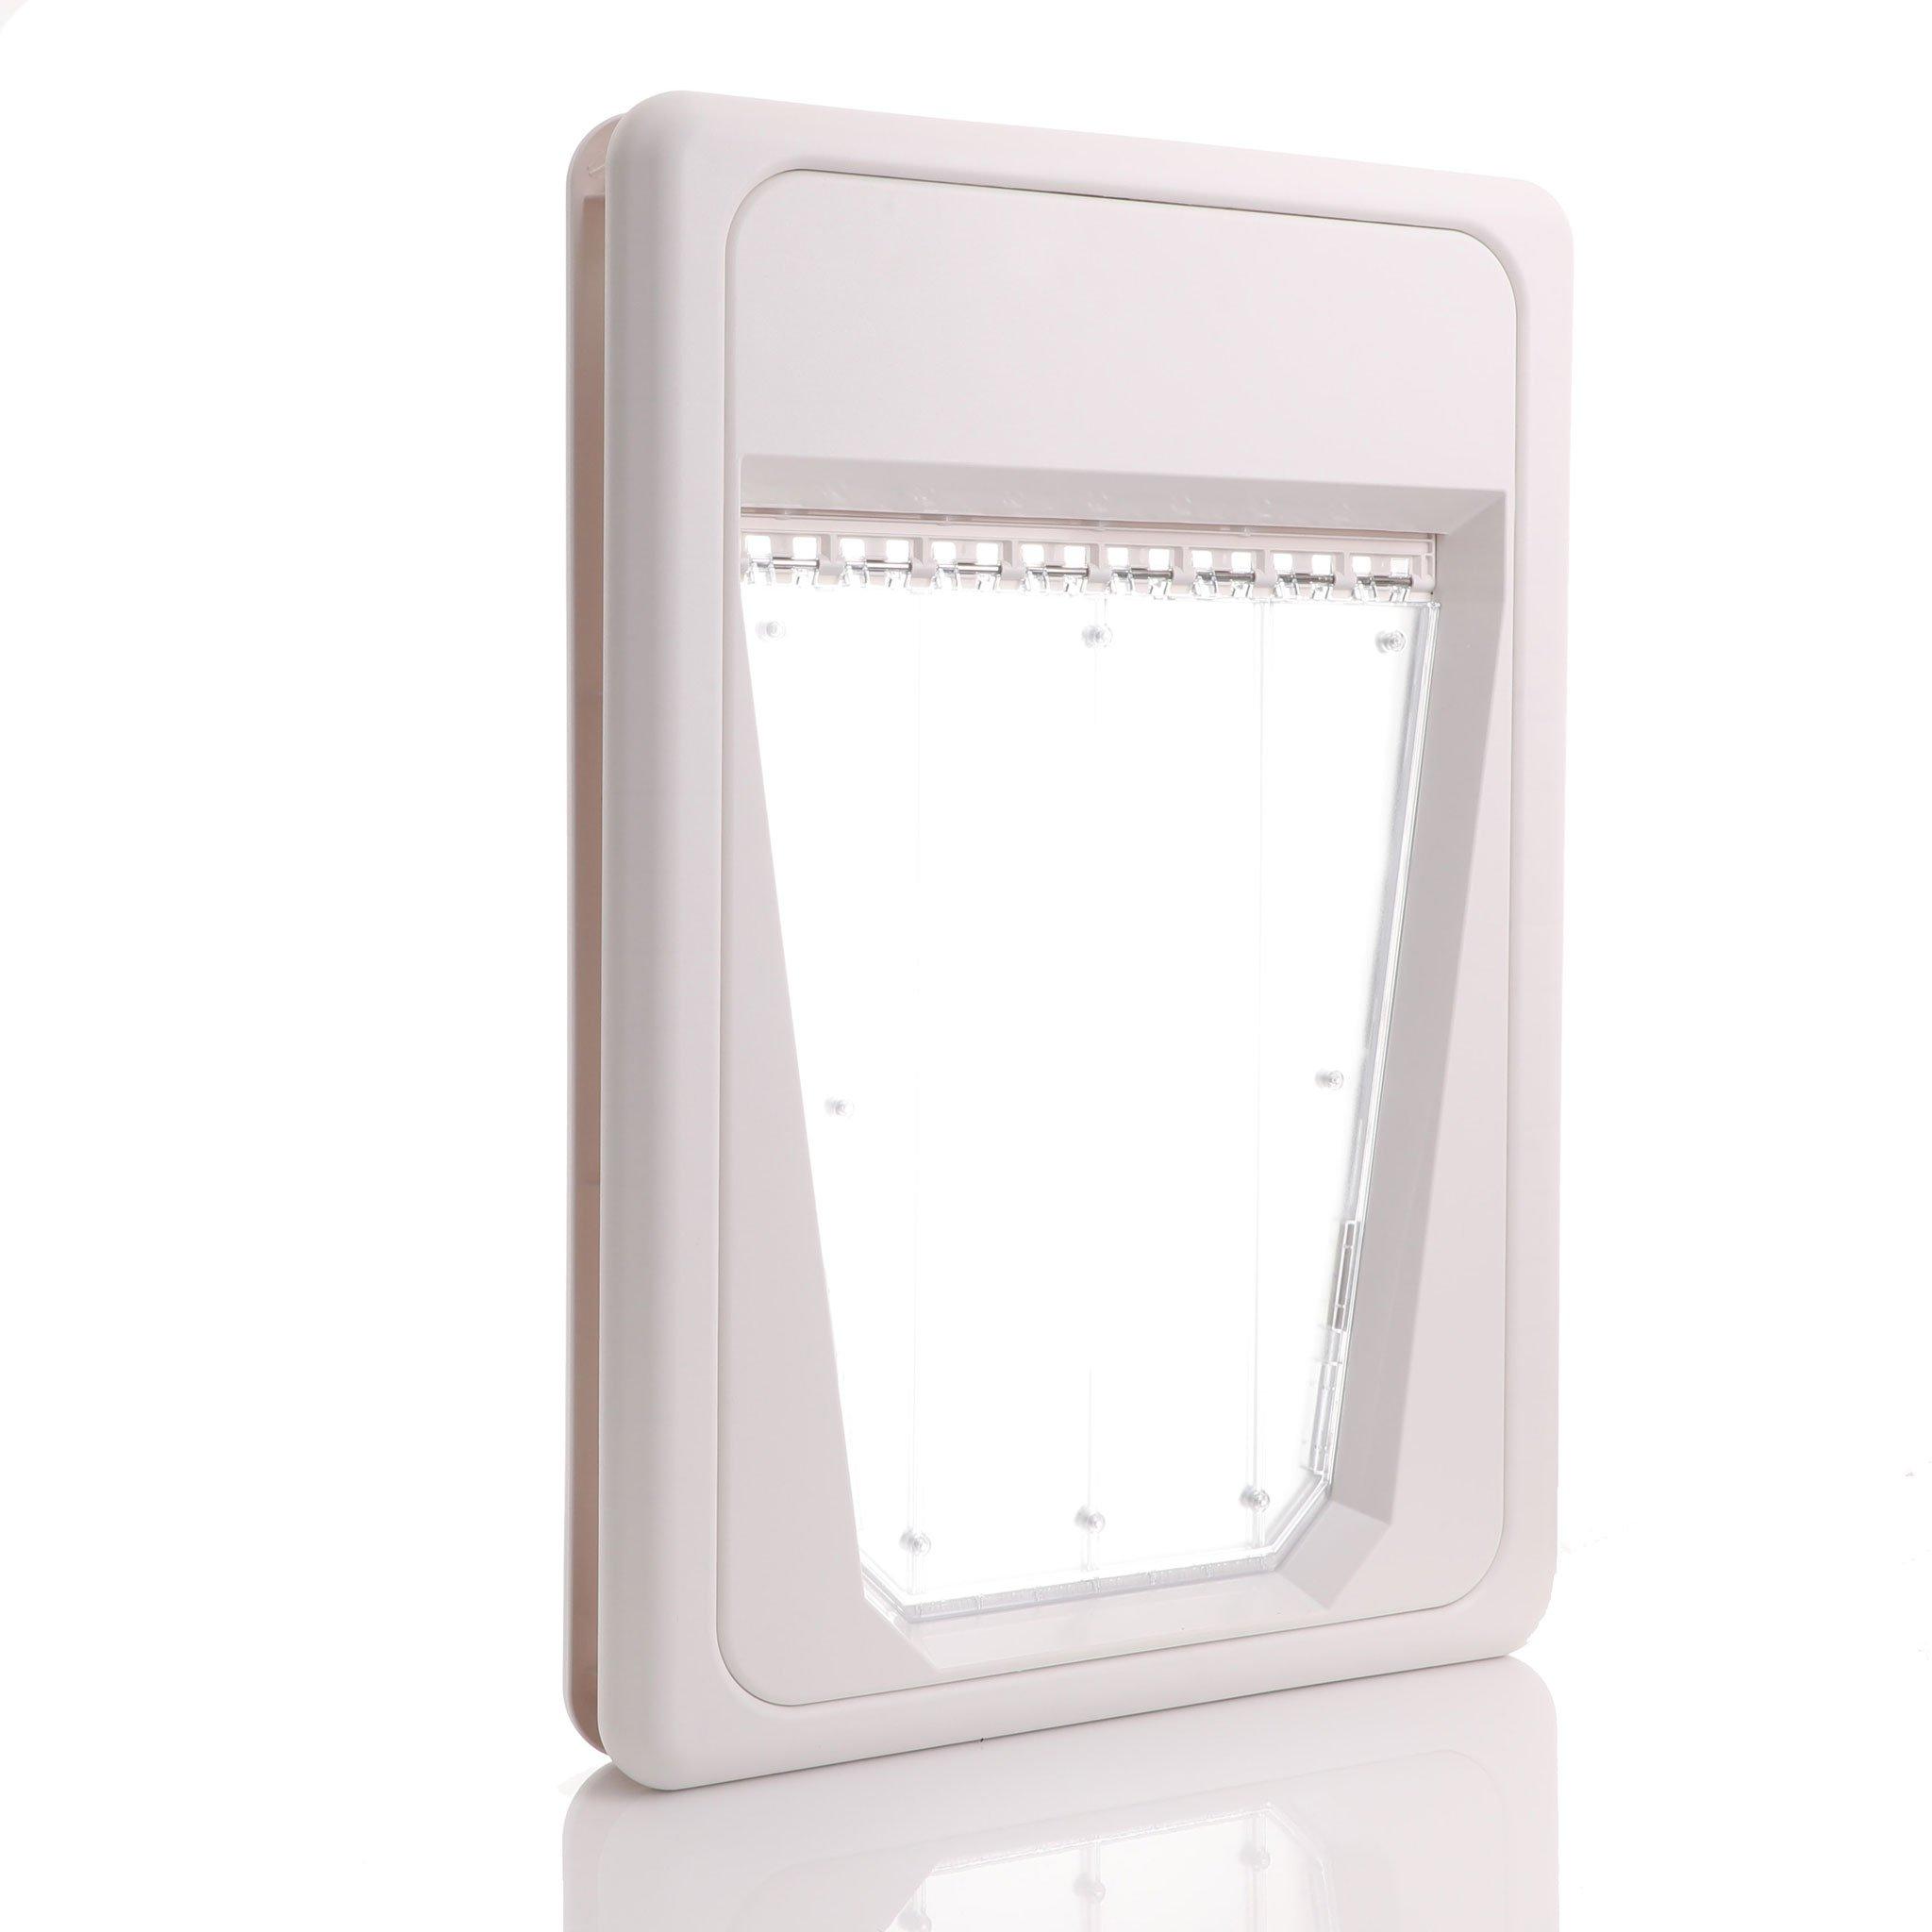 Electronic door external view v shape flap